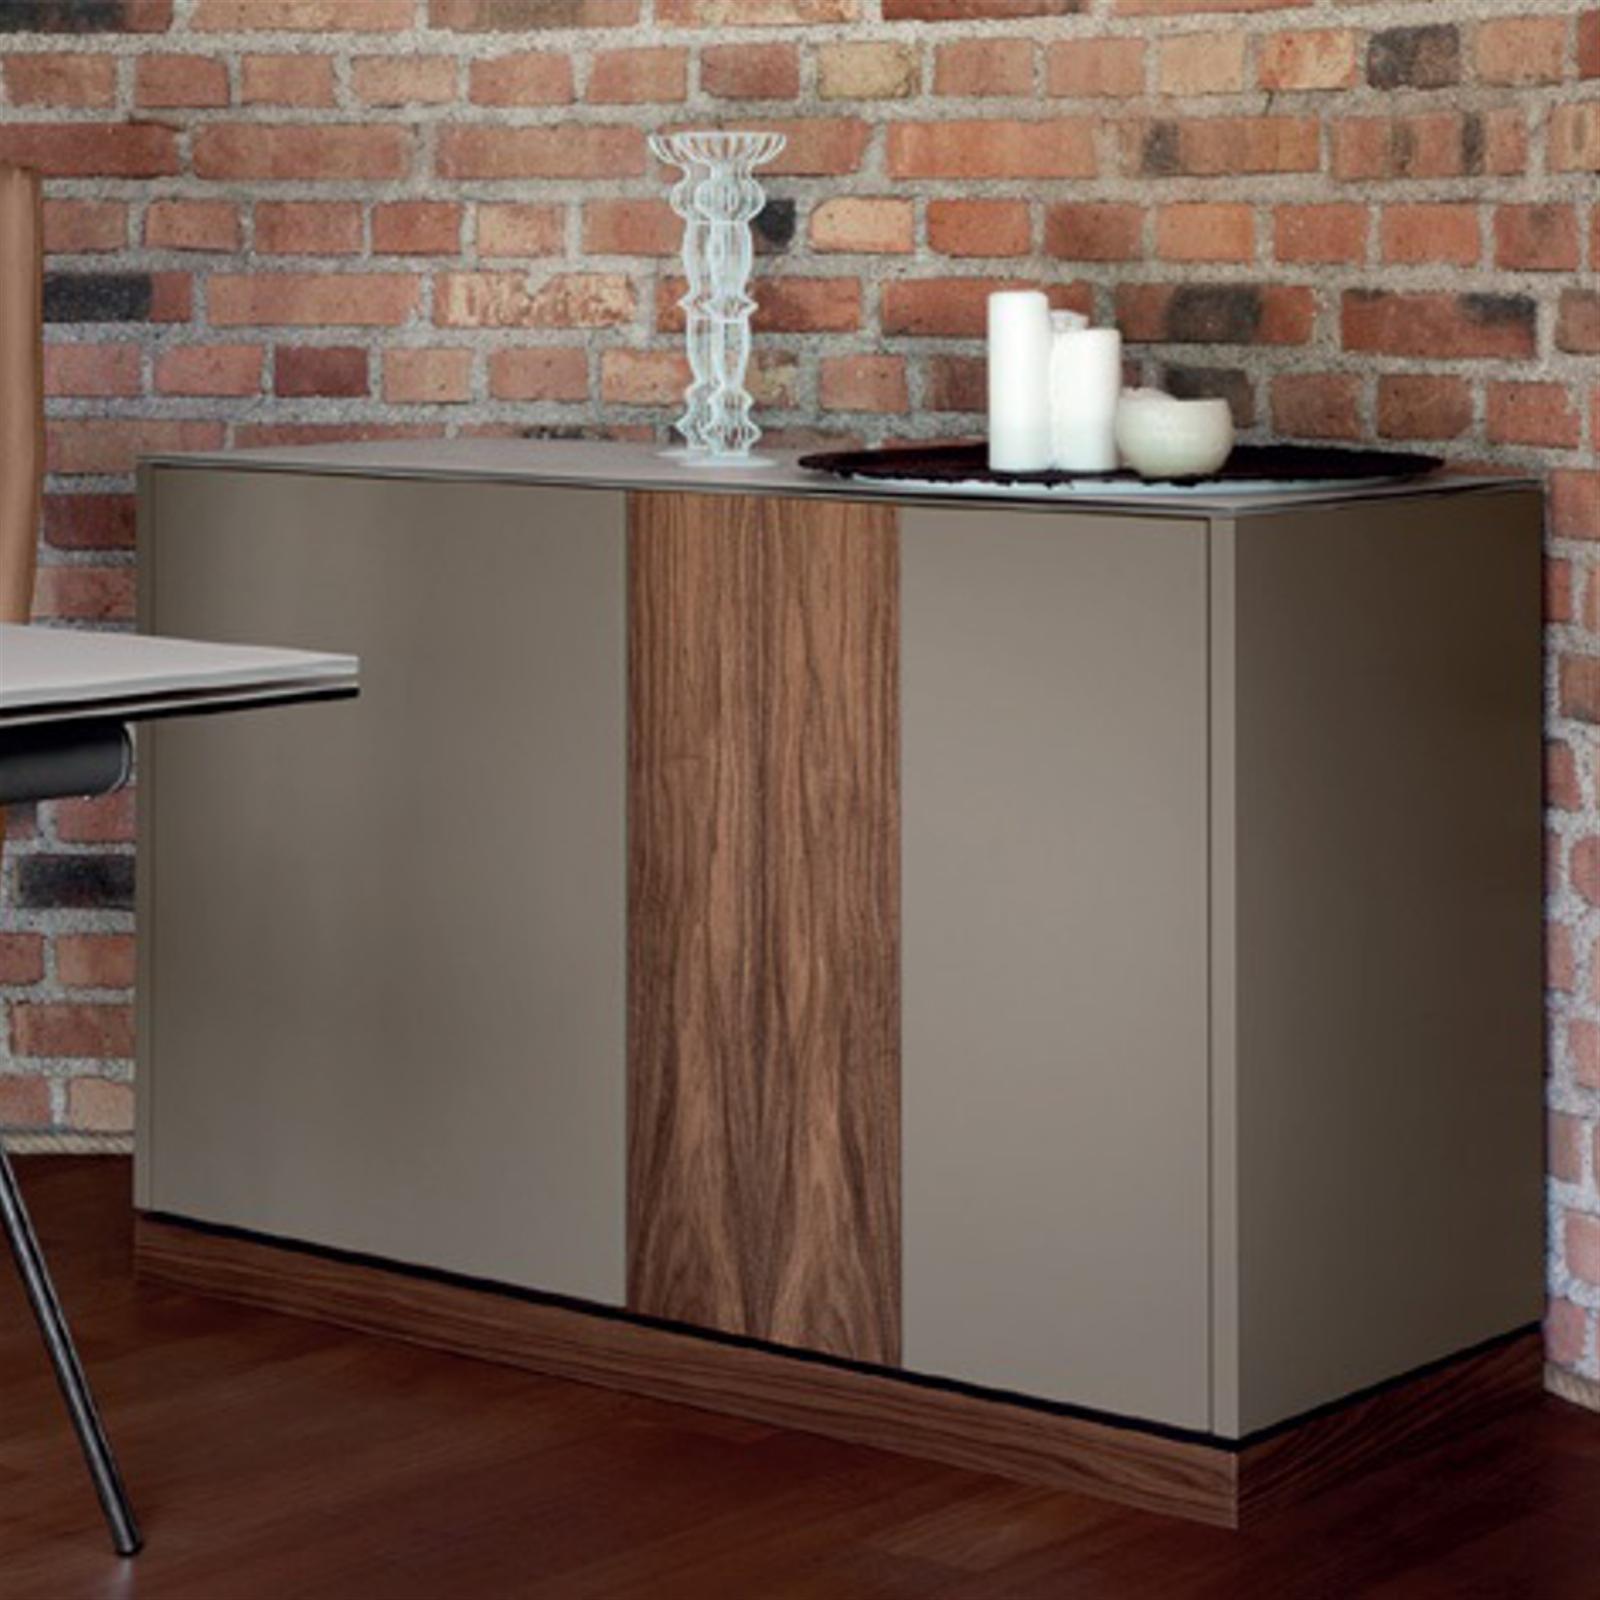 meuble bahut design italien cool buffet design italien with meuble bahut design italien. Black Bedroom Furniture Sets. Home Design Ideas